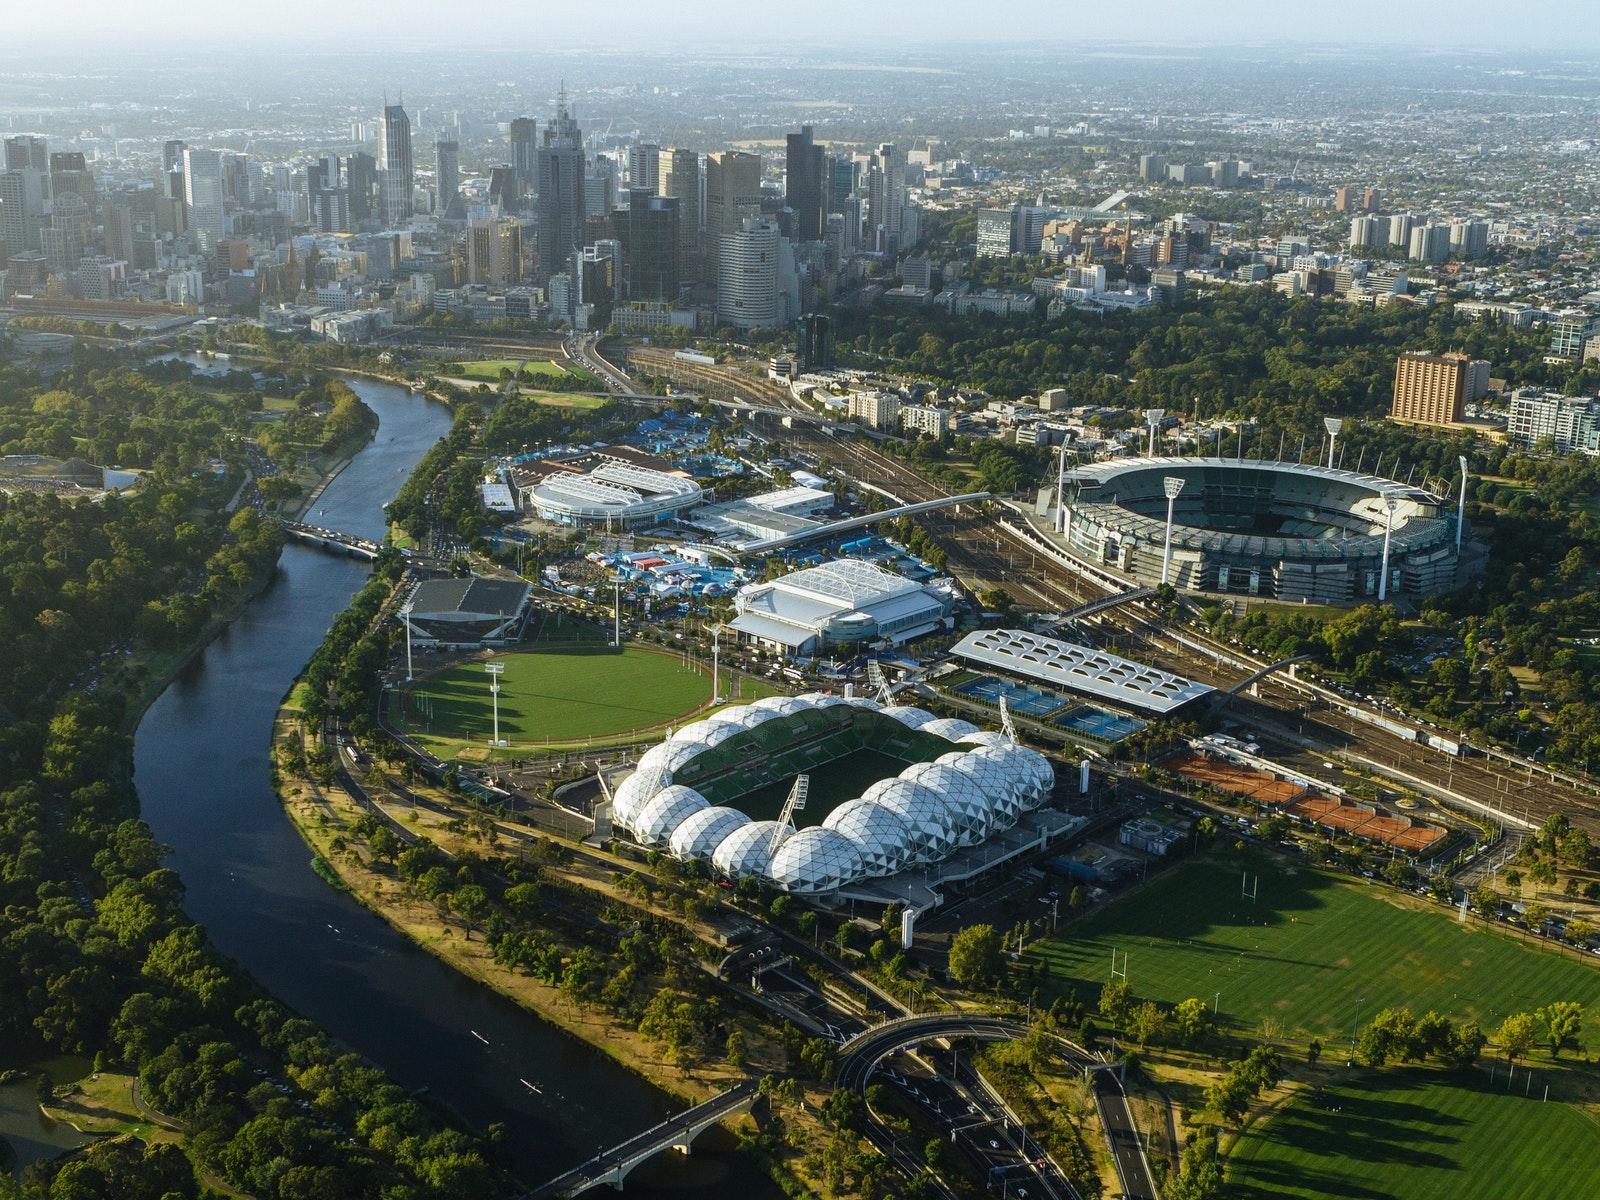 Melbourne's sports precinct